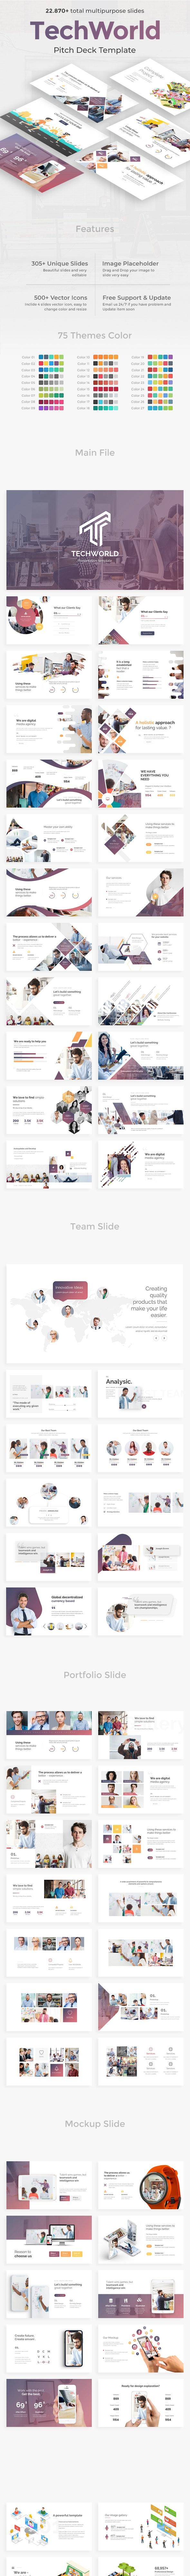 TechWorld Pitch Deck Multipurpose Google Slide Template - Google Slides Presentation Templates